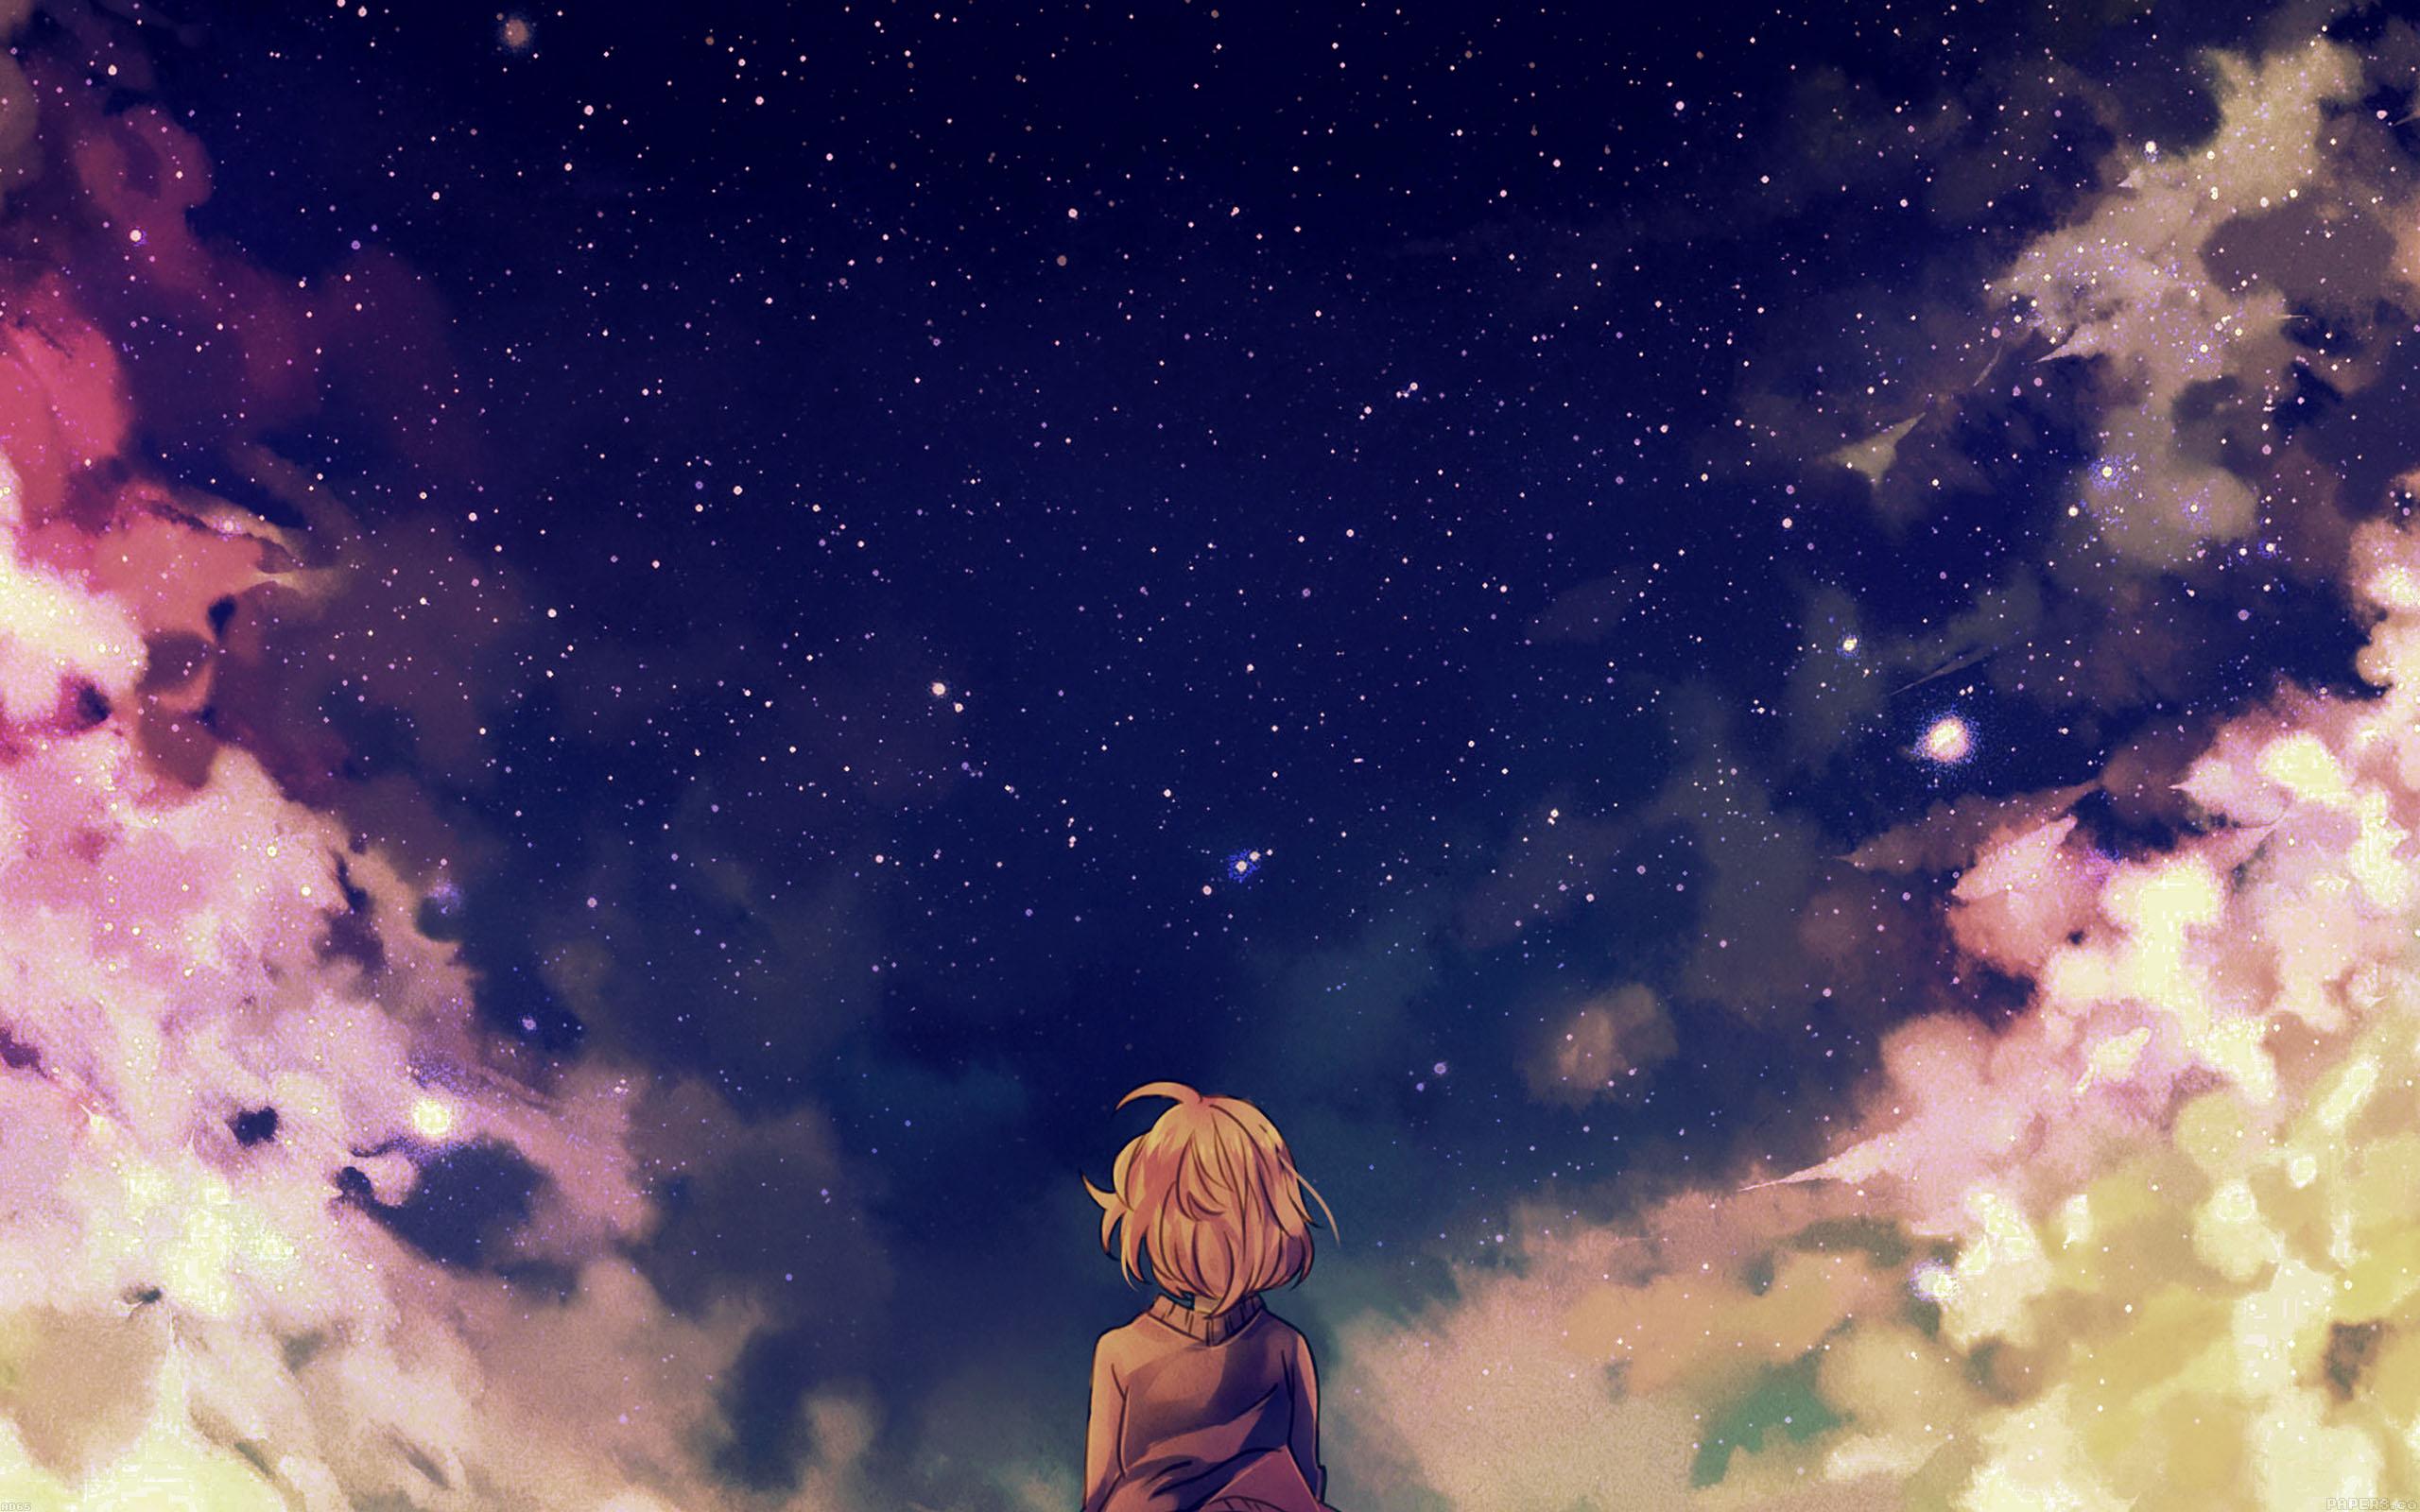 Best Cute Sad Girl Hd Wallpaper Ad65 Starry Space Illust Anime Girl Wallpaper